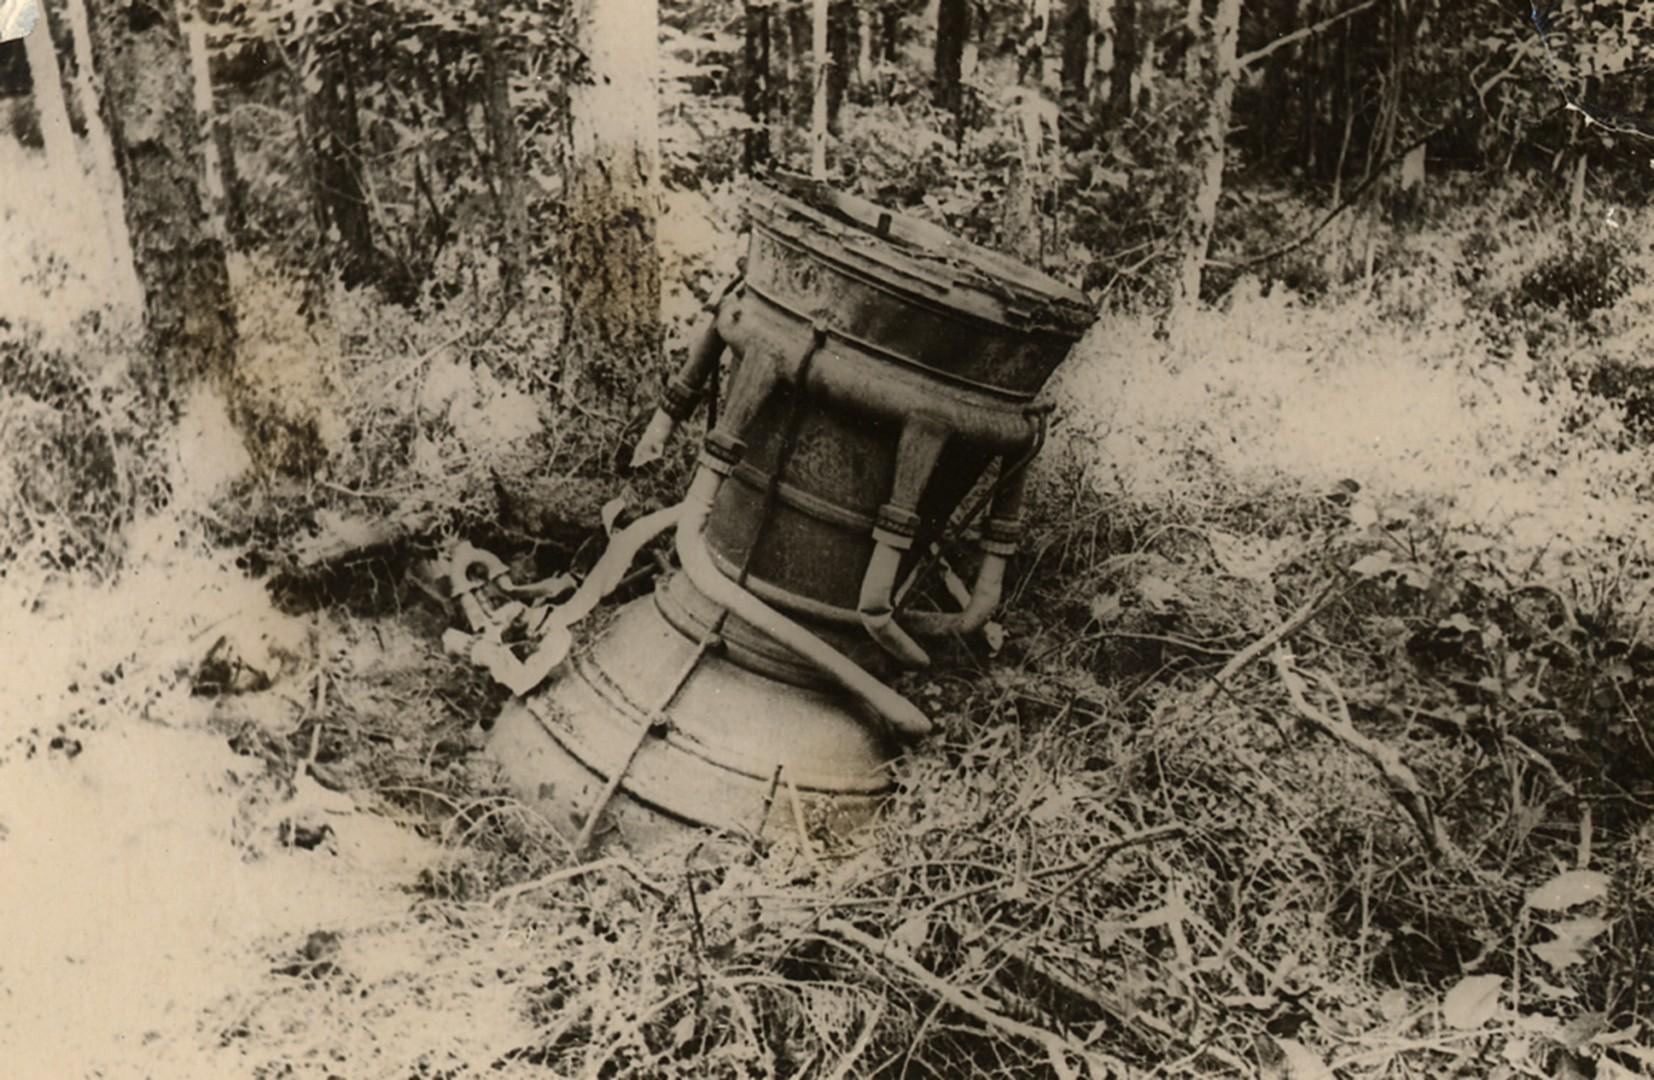 Двигательная установка ракеты А-4 («Фау-2») в лесу. Фото Ю.А. Победоносцева Польша, Дебице. 1944 г.